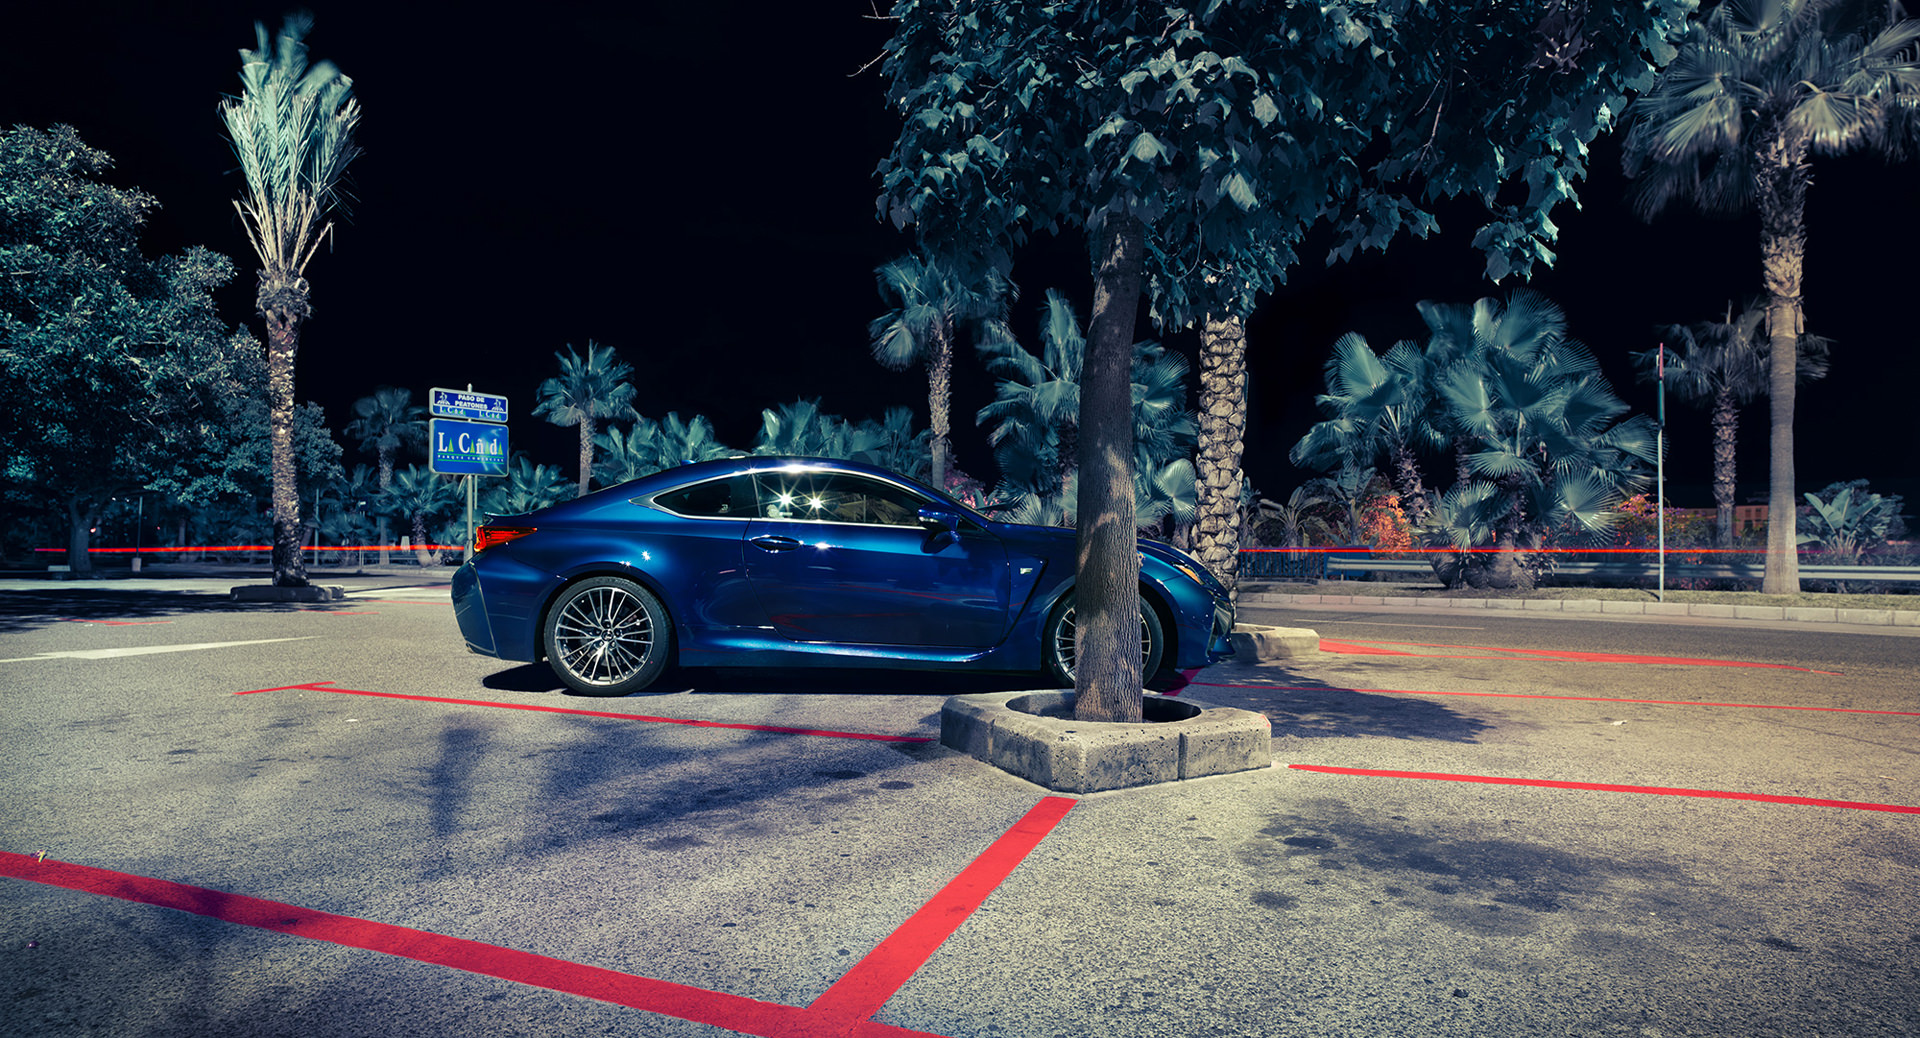 Transportation, Spain, Lexus, GQ, anke luckmann, kai tietz, www.ankeluckmann.com, michael hanisch, editorial, lexus rc f, roya norouzi, conde nast verlag